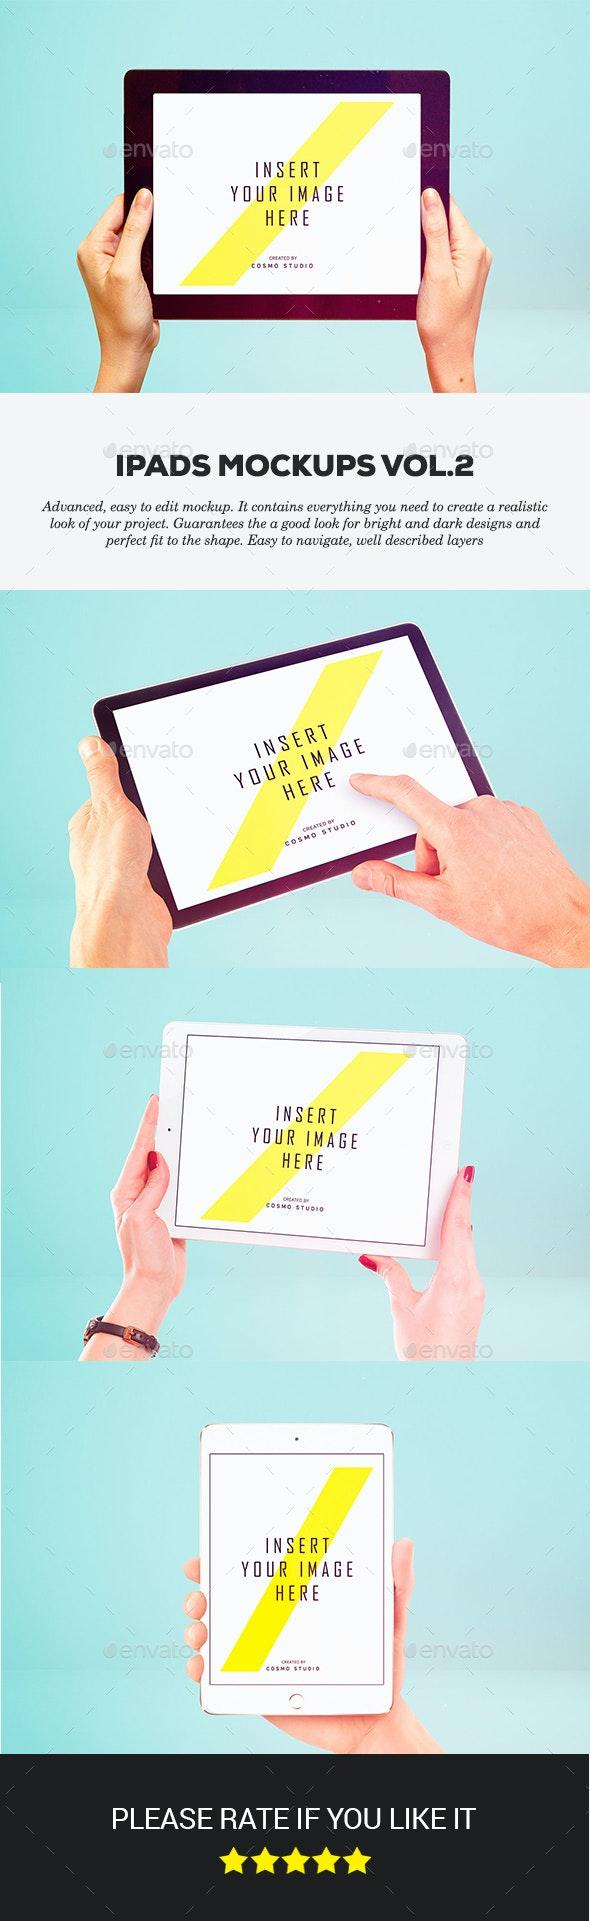 iPads Mockups Vol.3 - Displays Product Mock-Ups